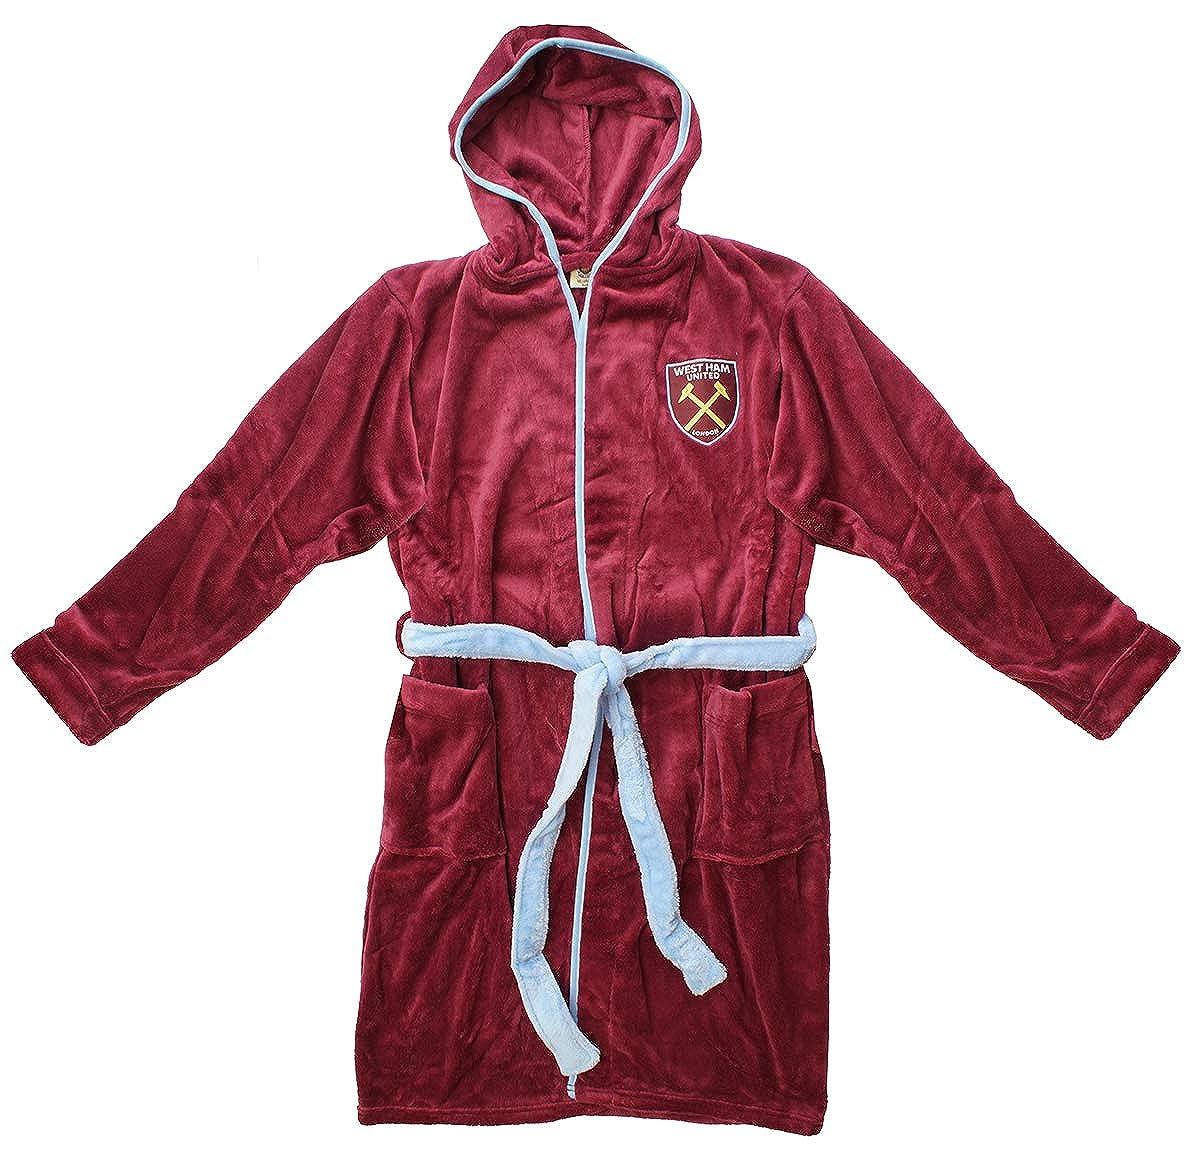 Mens Official WEST HAM United FC Fleece Dressing Gown Hooded Bathrobe Sizes S M L XL